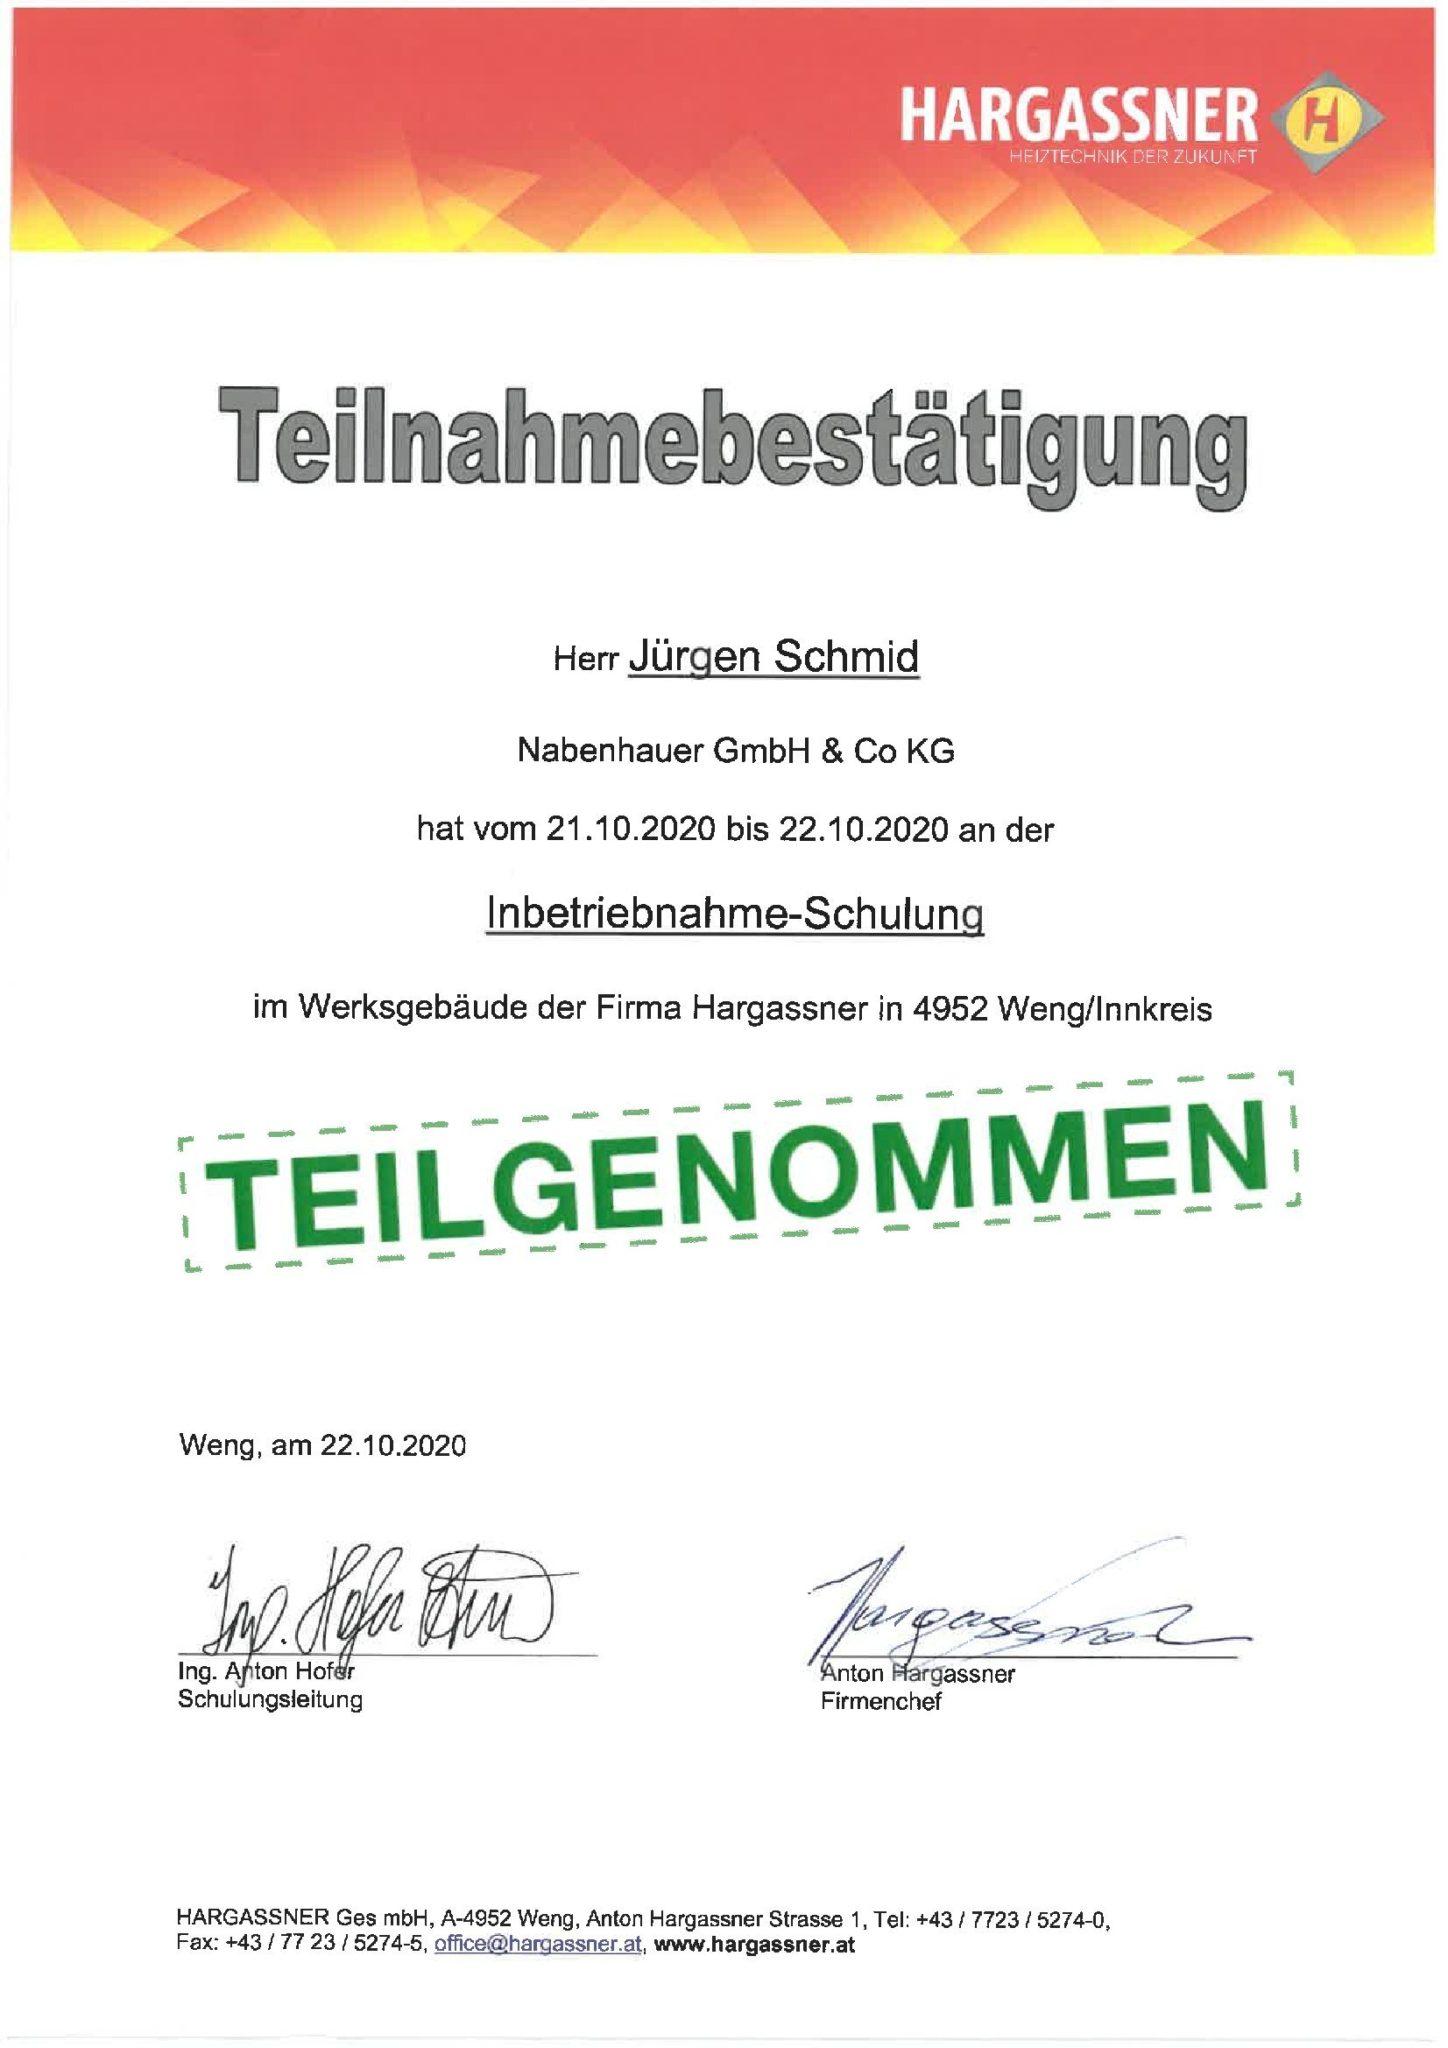 Schmid Jürgen Hargassner Inbetriebnahme Schulung